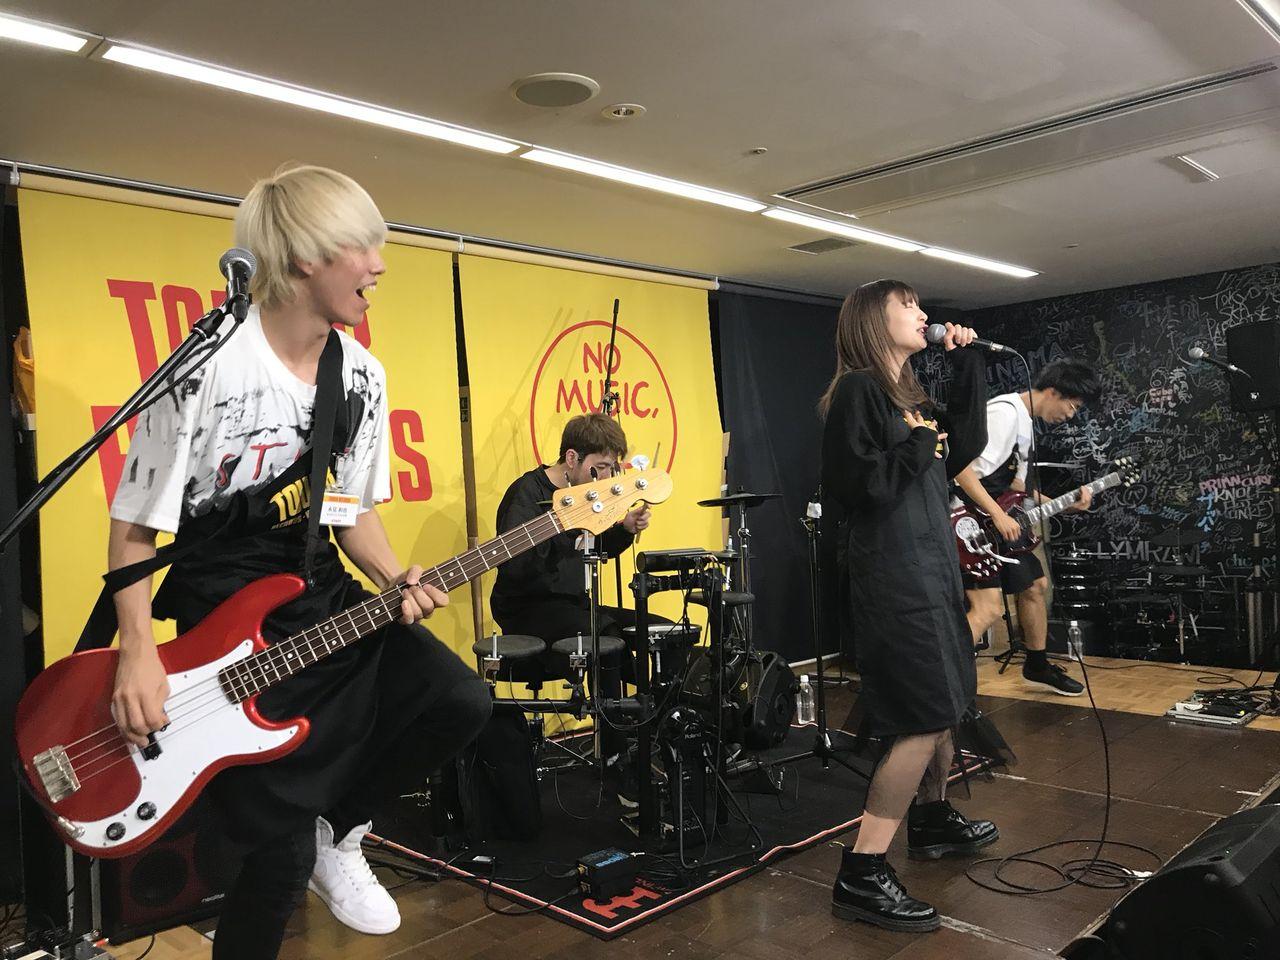 【NMB48】元メンバー岸野里香、突然のデキ結婚。所属バンドは解散